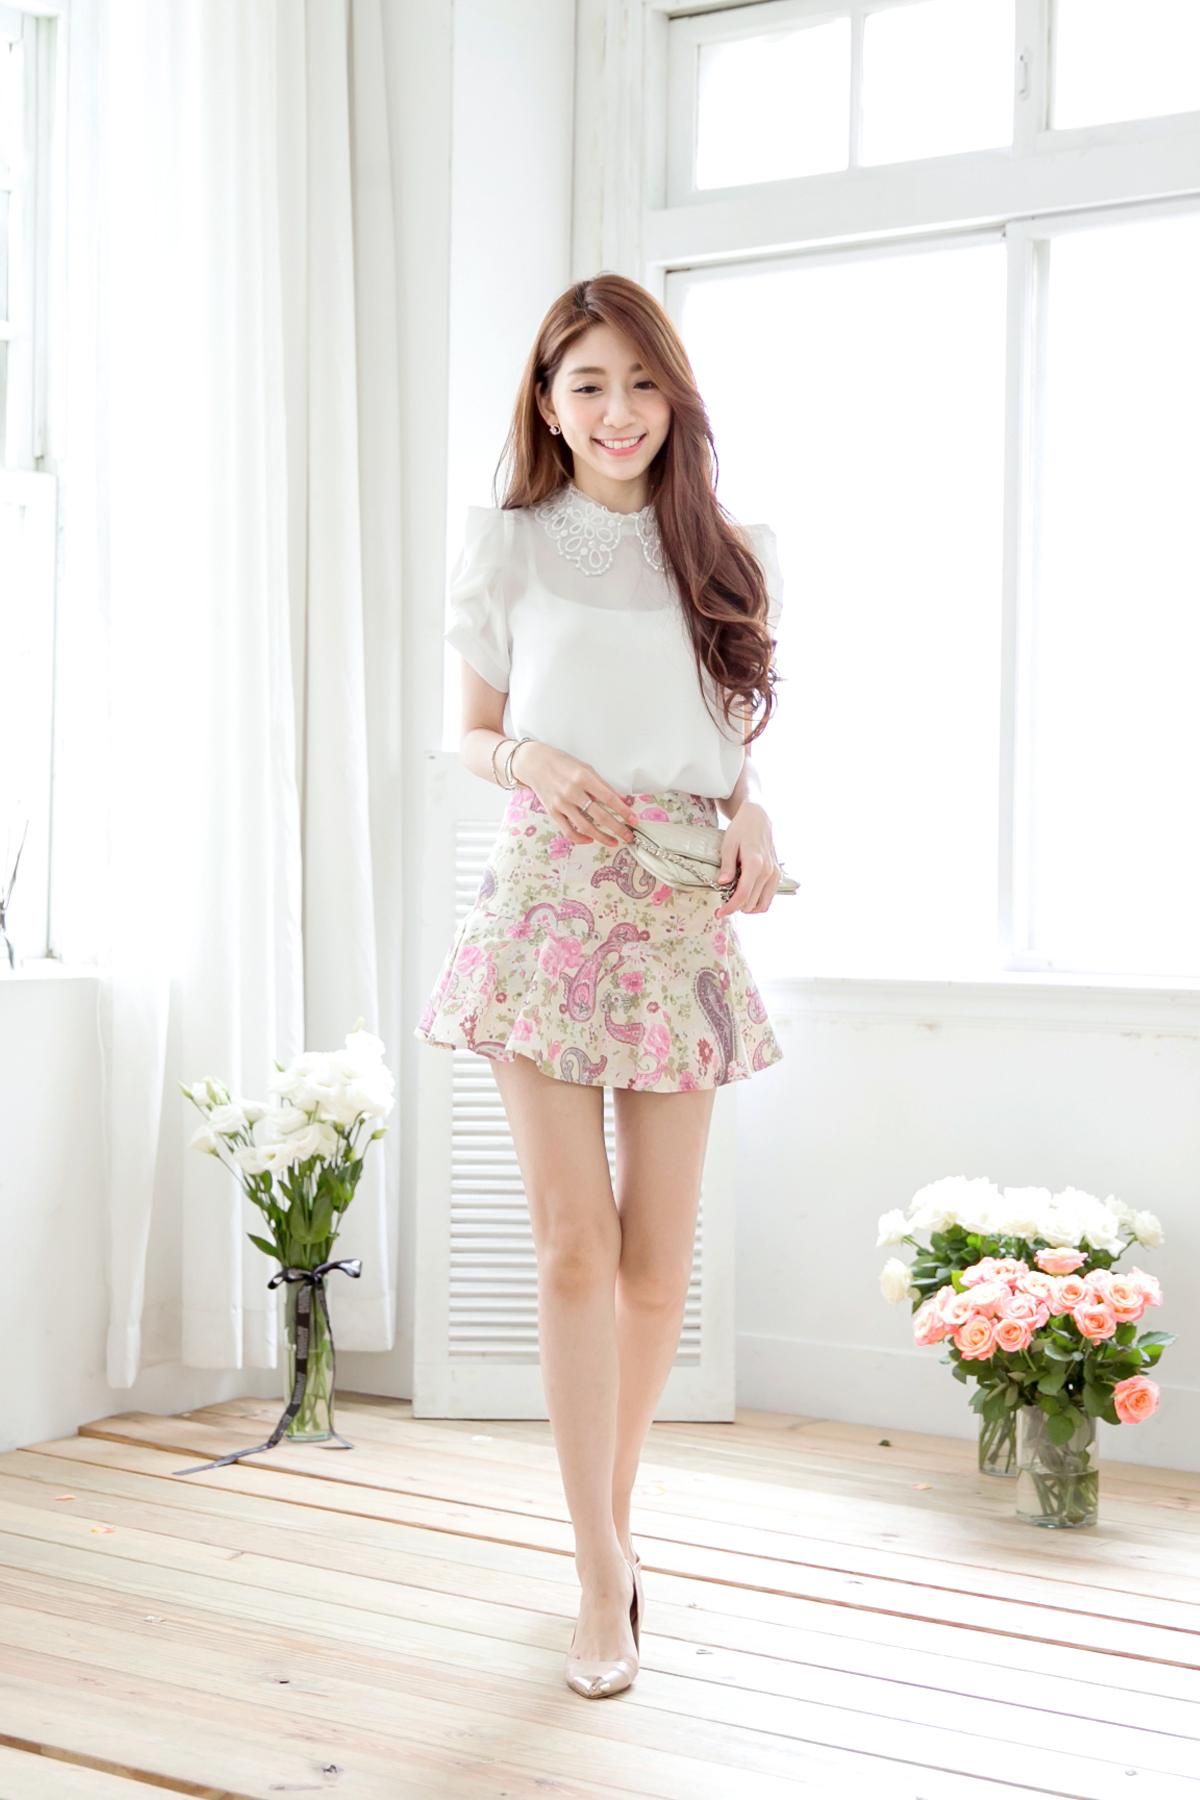 skirt Asian photos mini